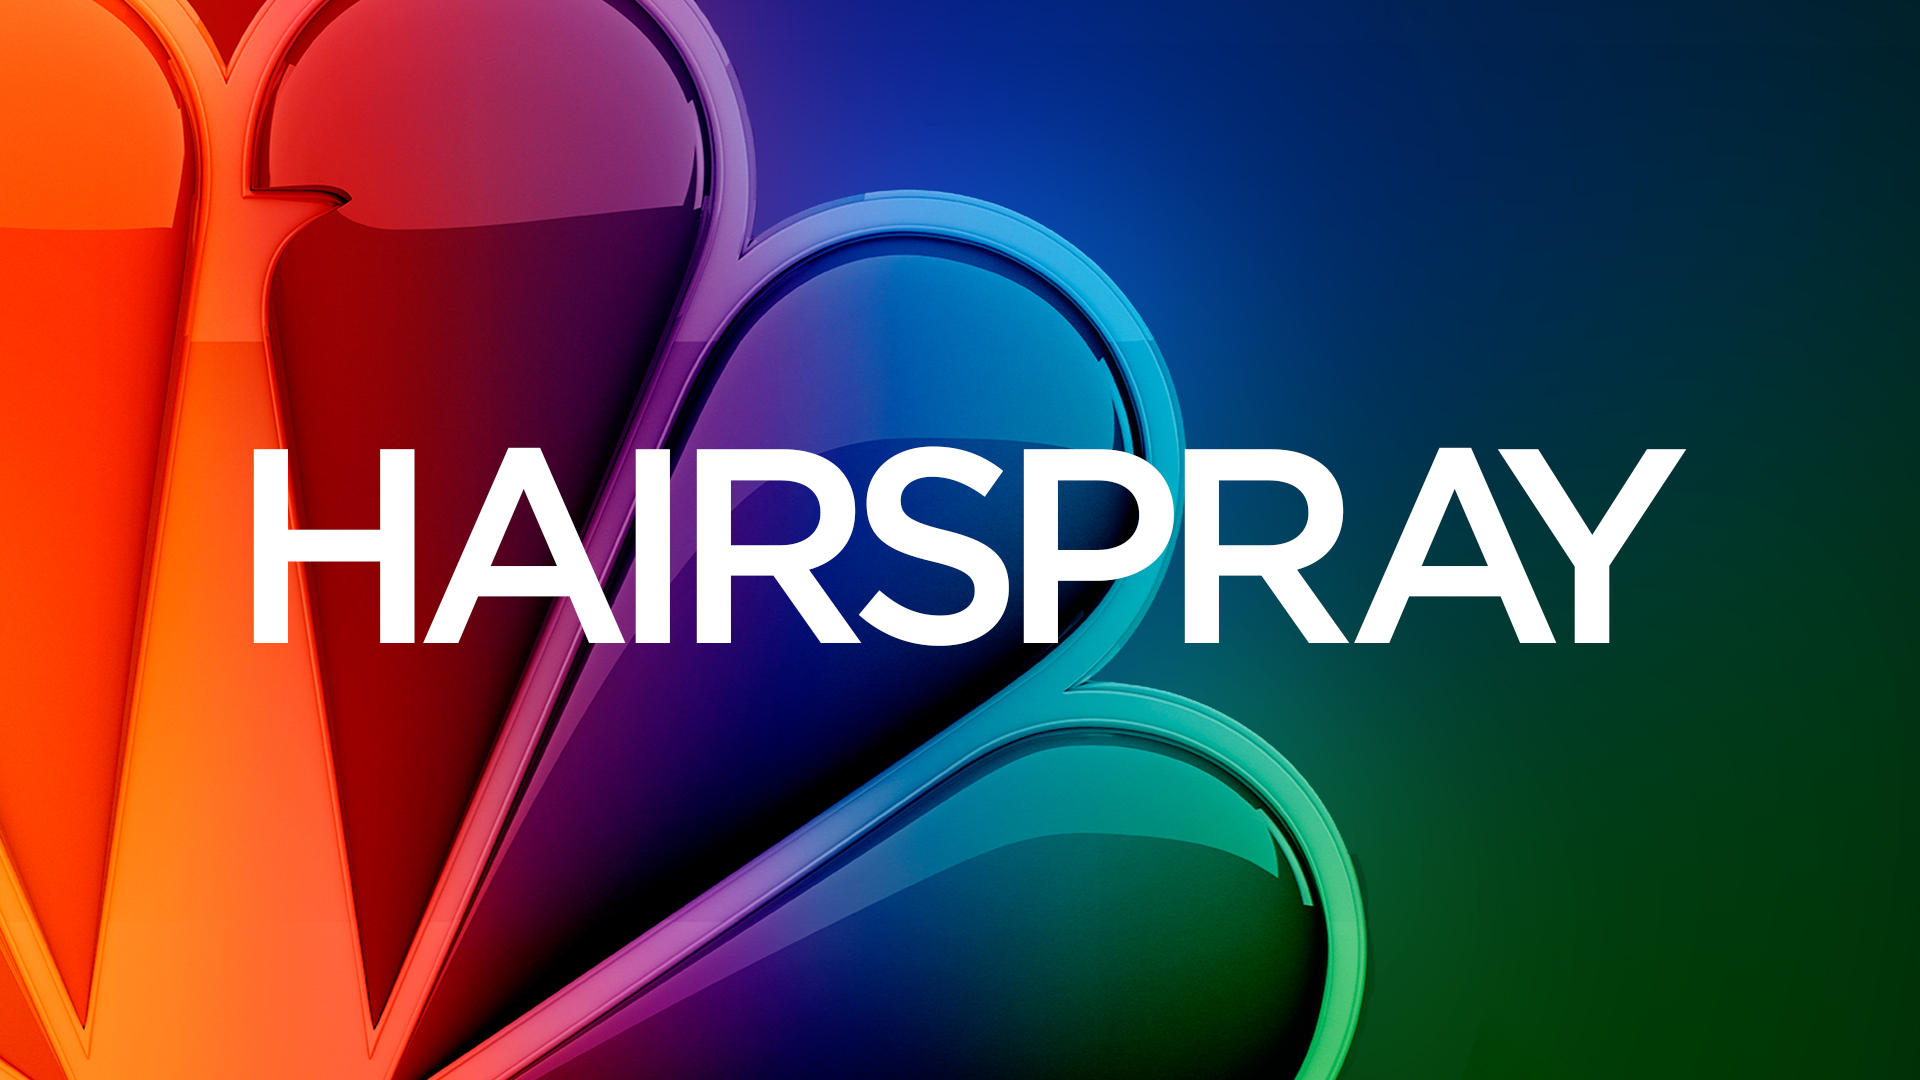 Hairspray live - Alternative uses of hairspray ...